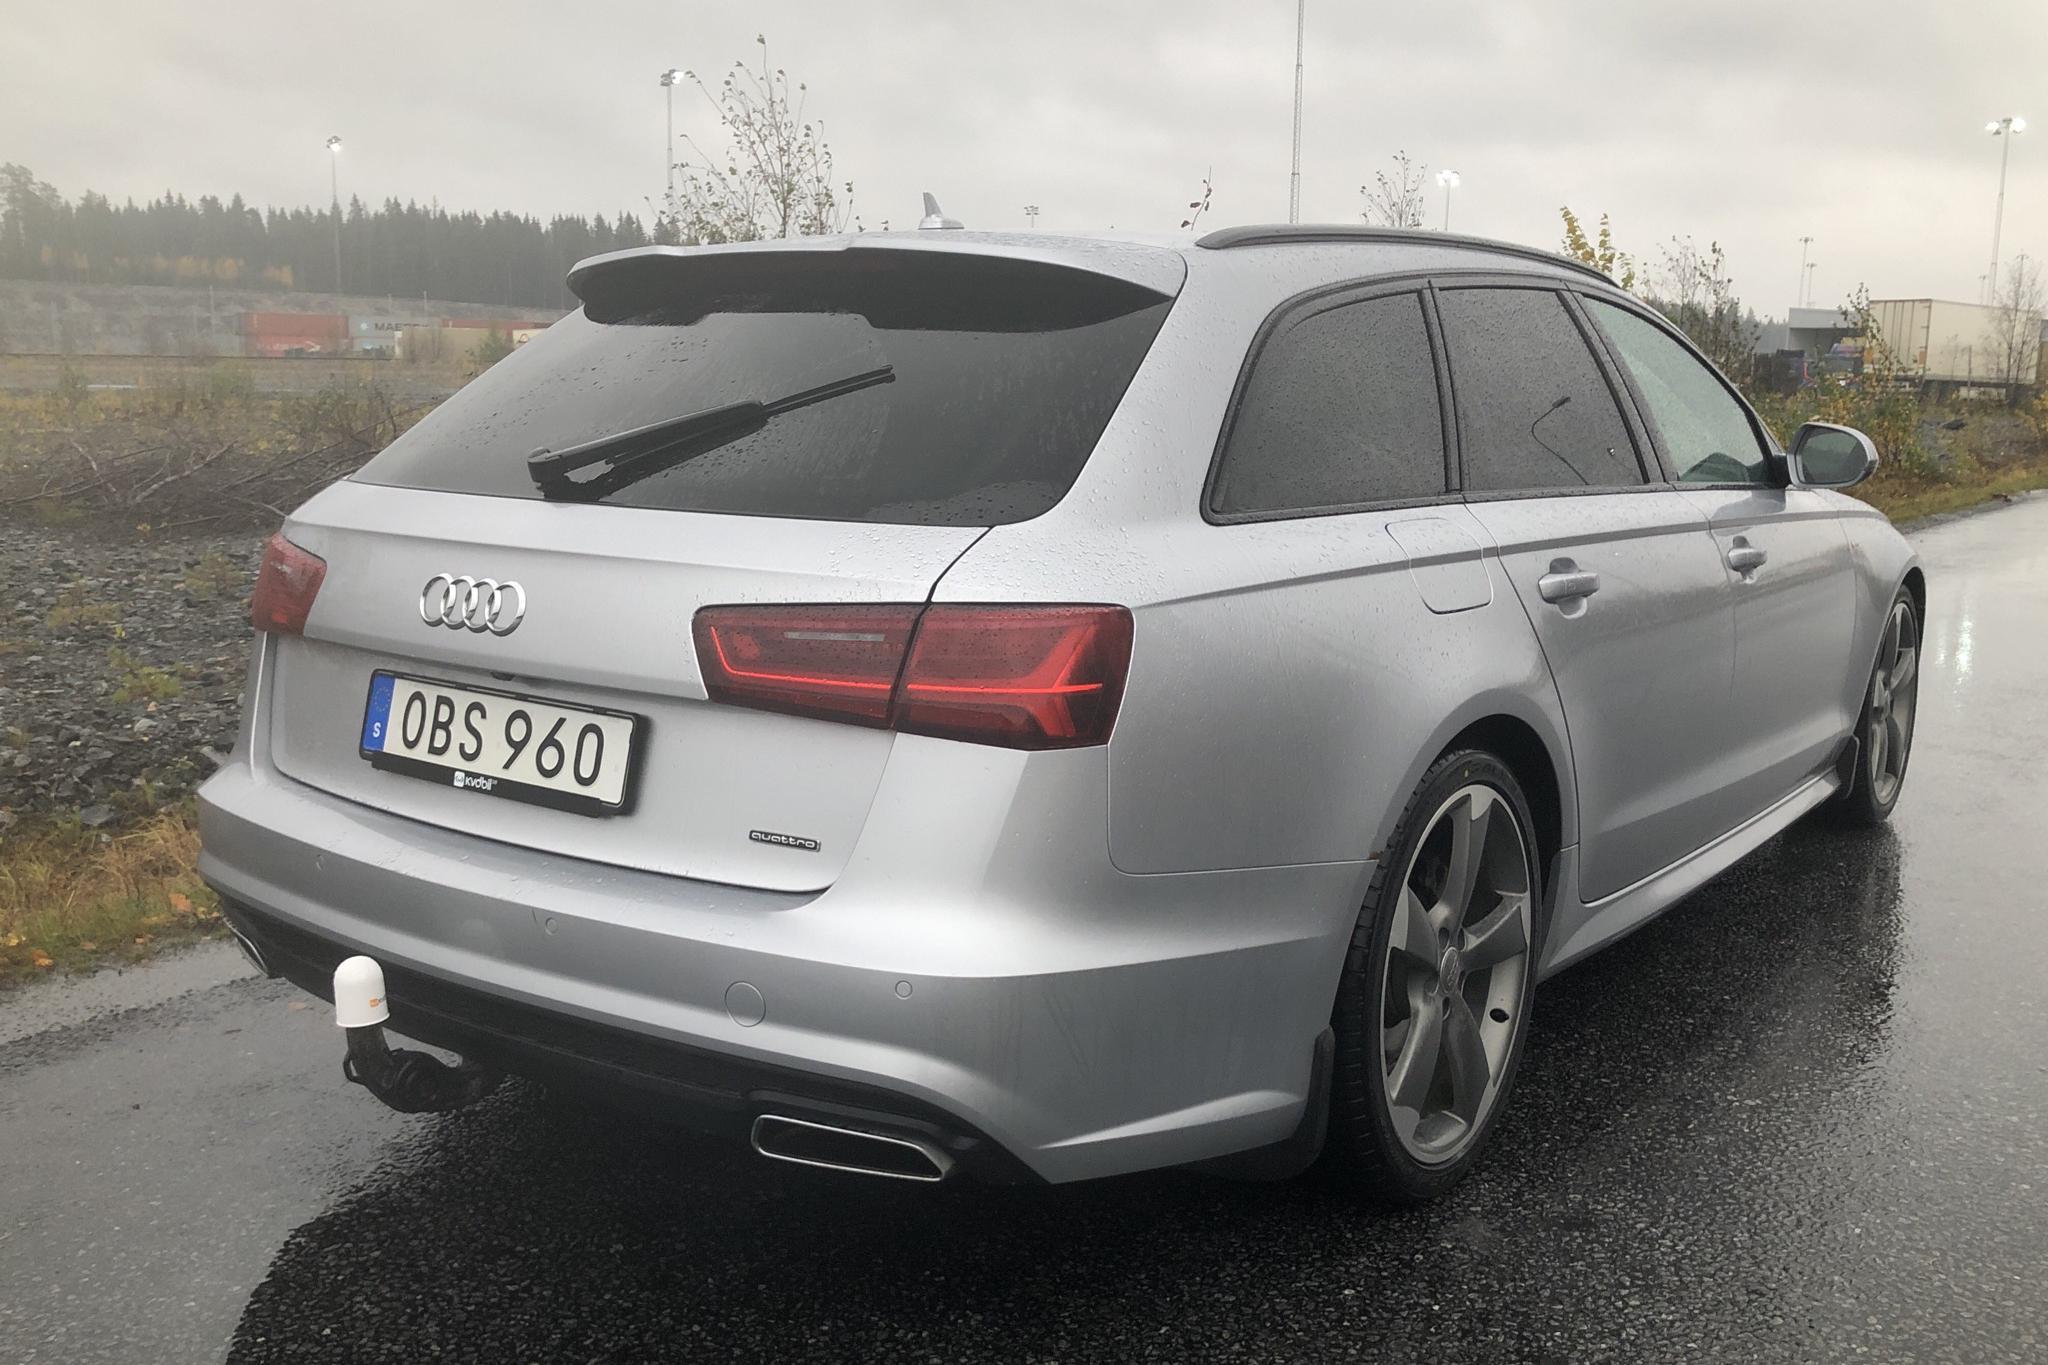 Audi A6 2.0 TDI Avant quattro (190hk) - 139 520 km - Automatic - silver - 2016